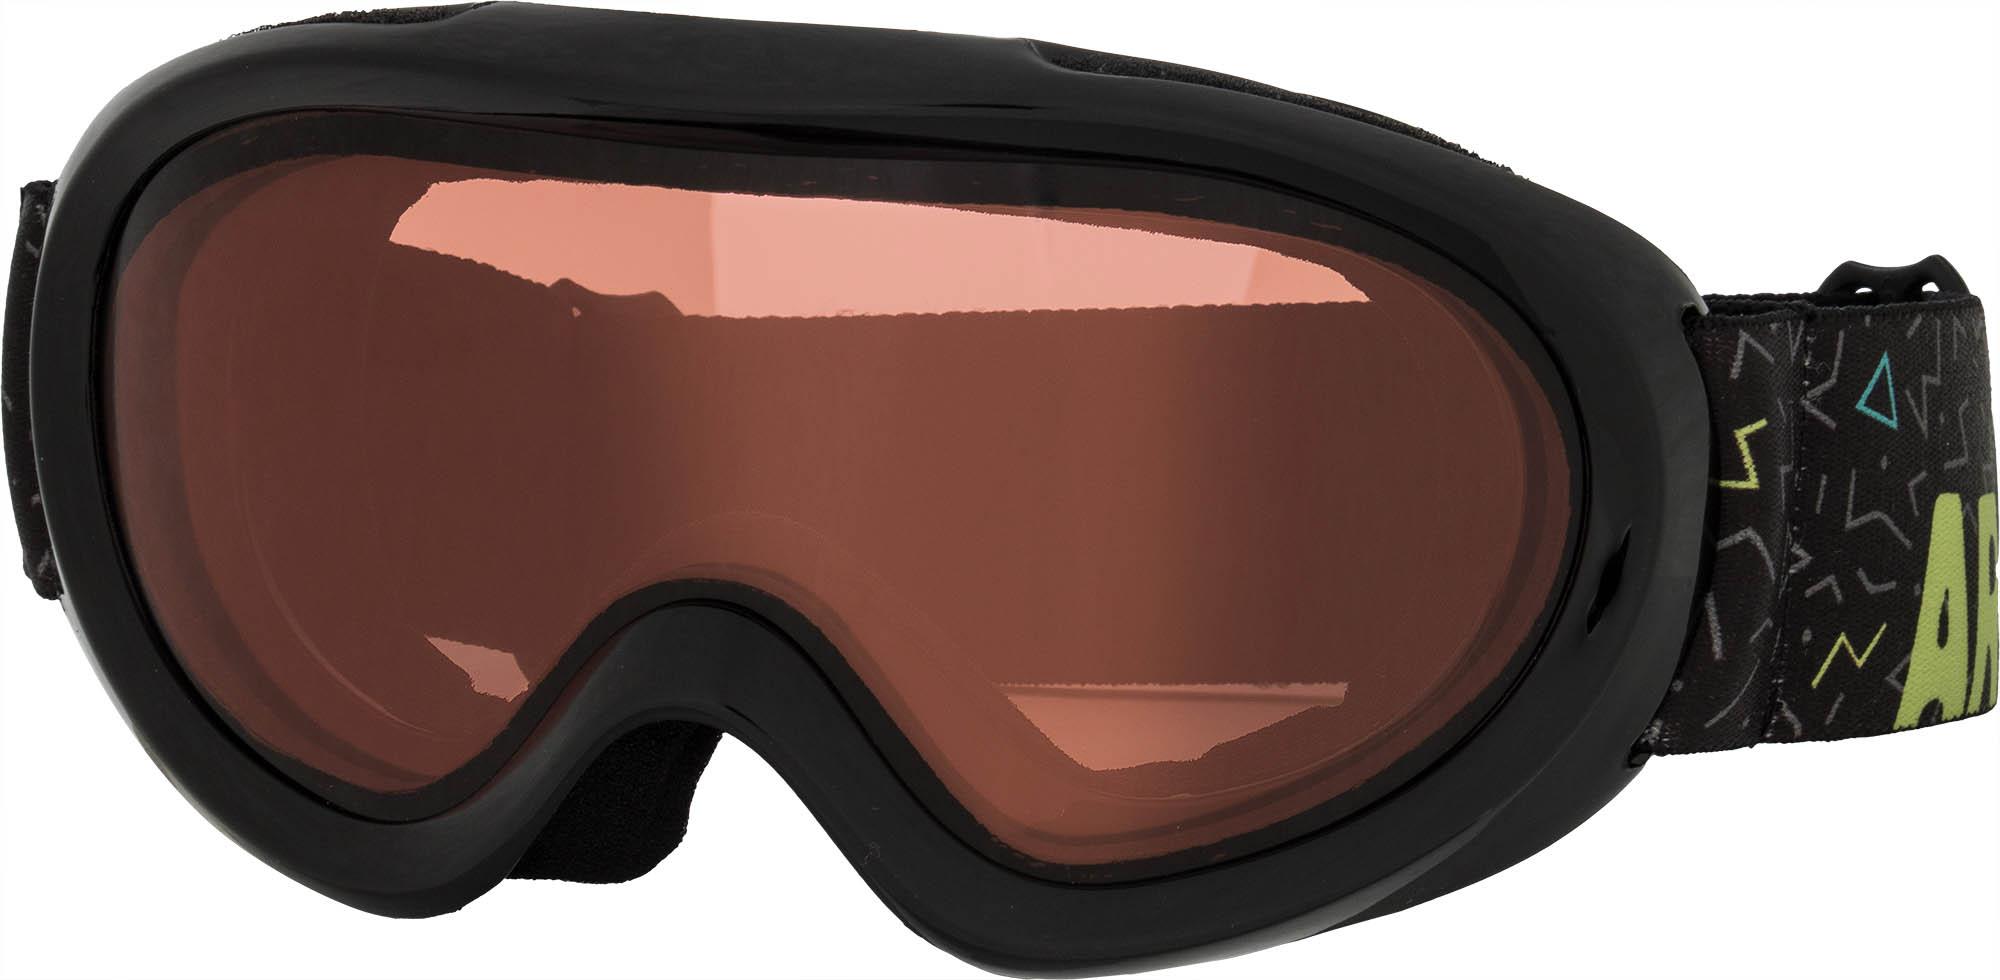 eea9884f9 Arcore VISBY. Juniorské lyžiarske okuliare